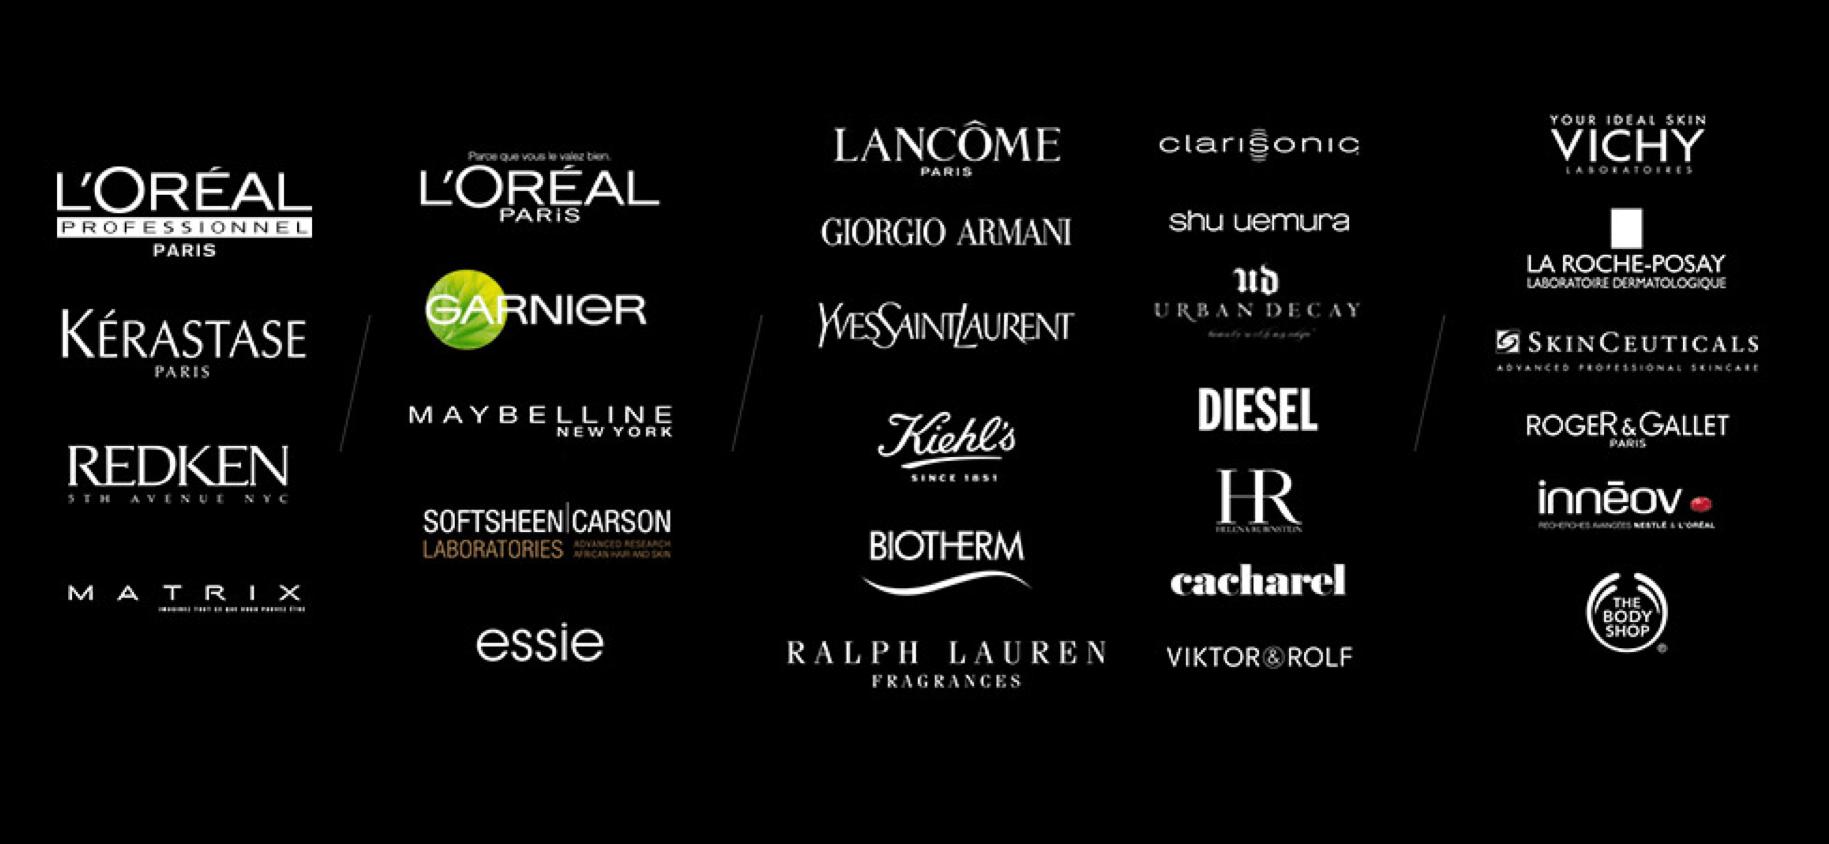 L'Oreal brands